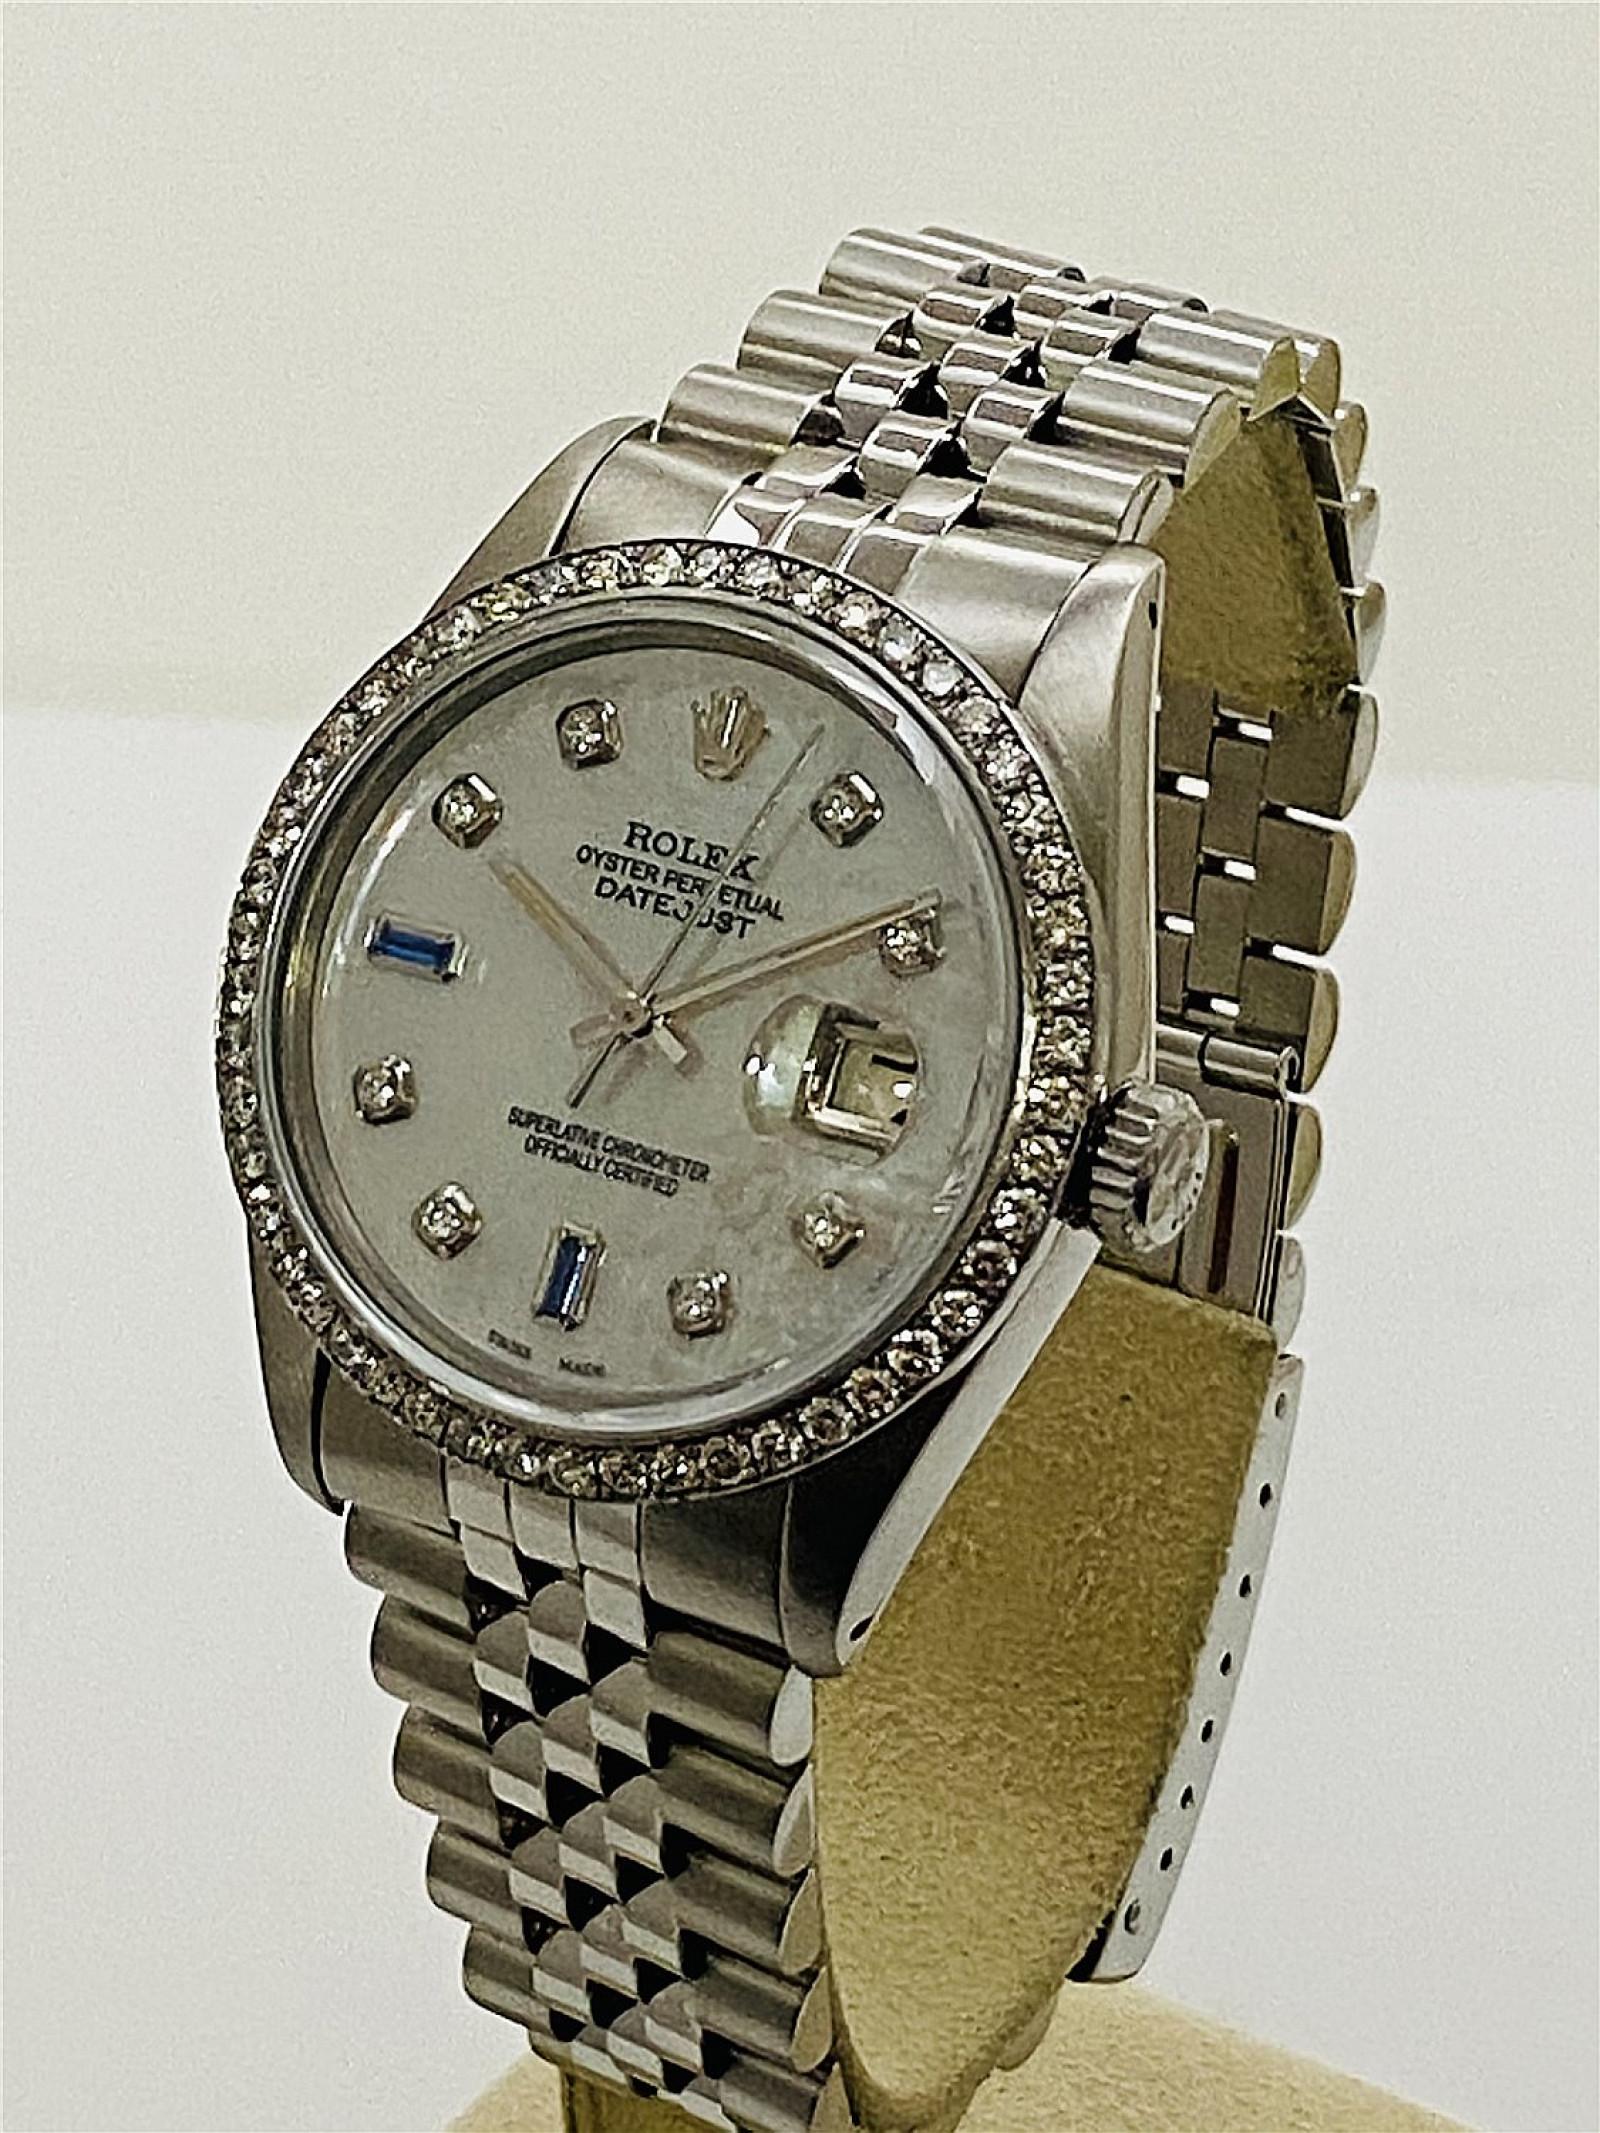 Diamond Rolex Datejust 16030 Two Tone